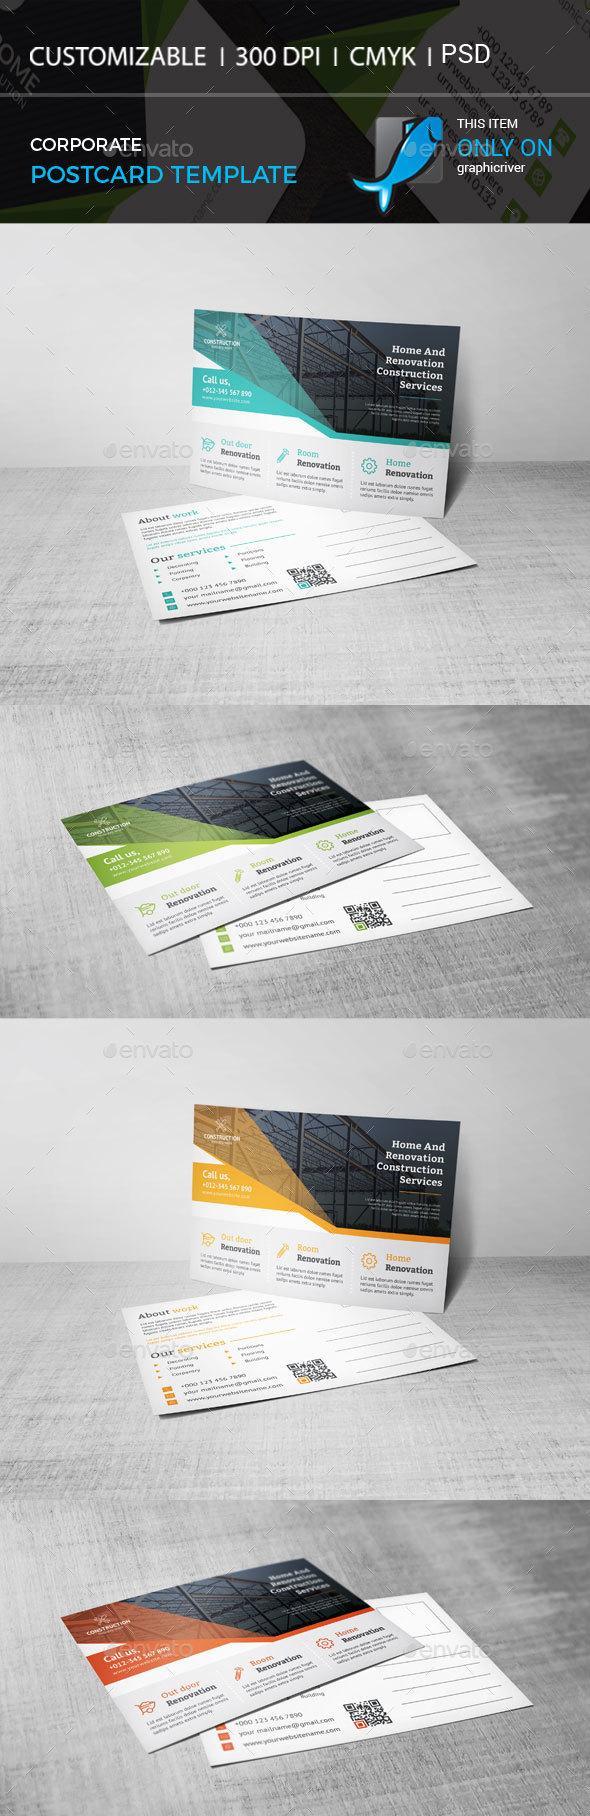 Postcard Template - Cards & Invites Print Templates